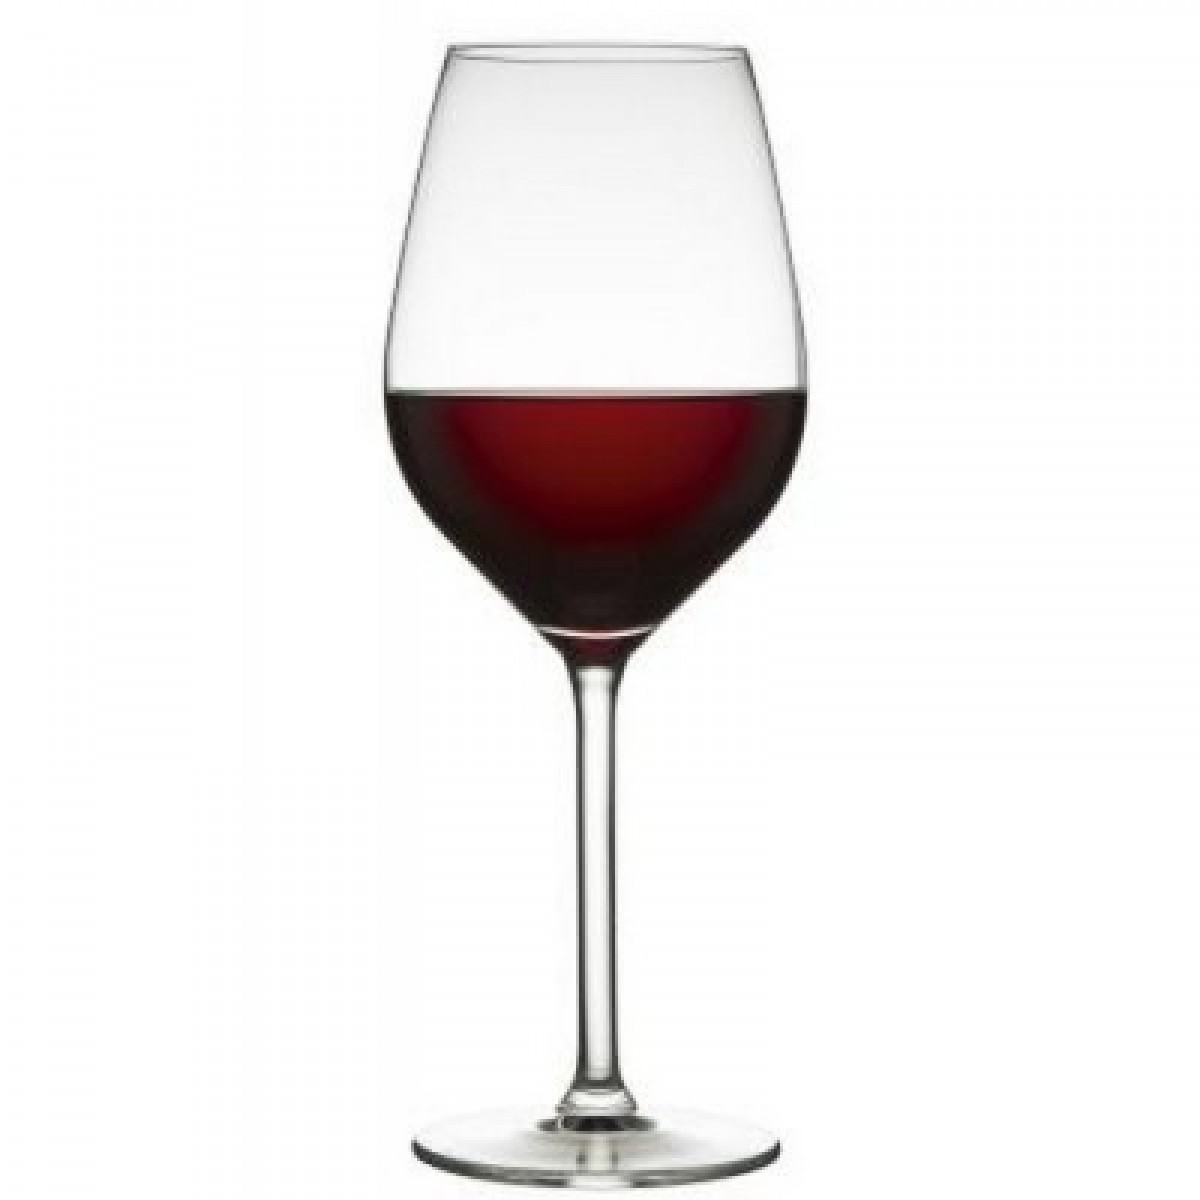 LYNGBY Juvel rødvinsglas 50 cl 4 stk